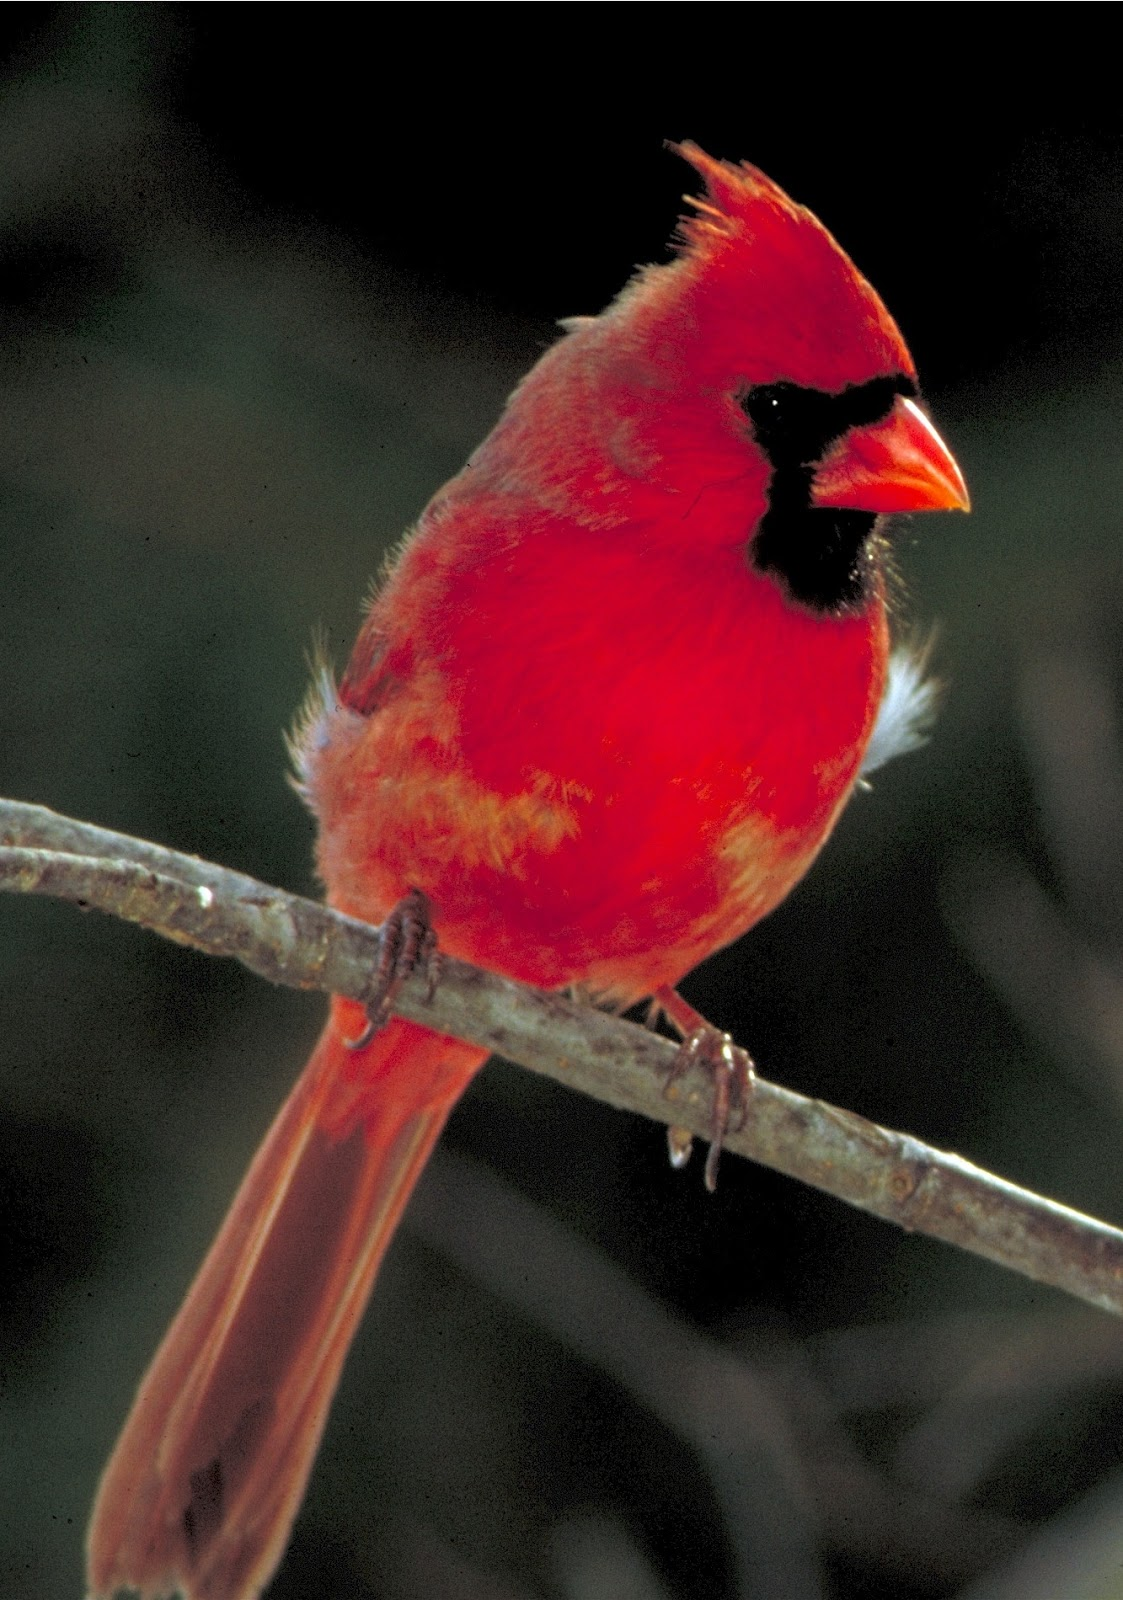 An image of a male cardinal bird.